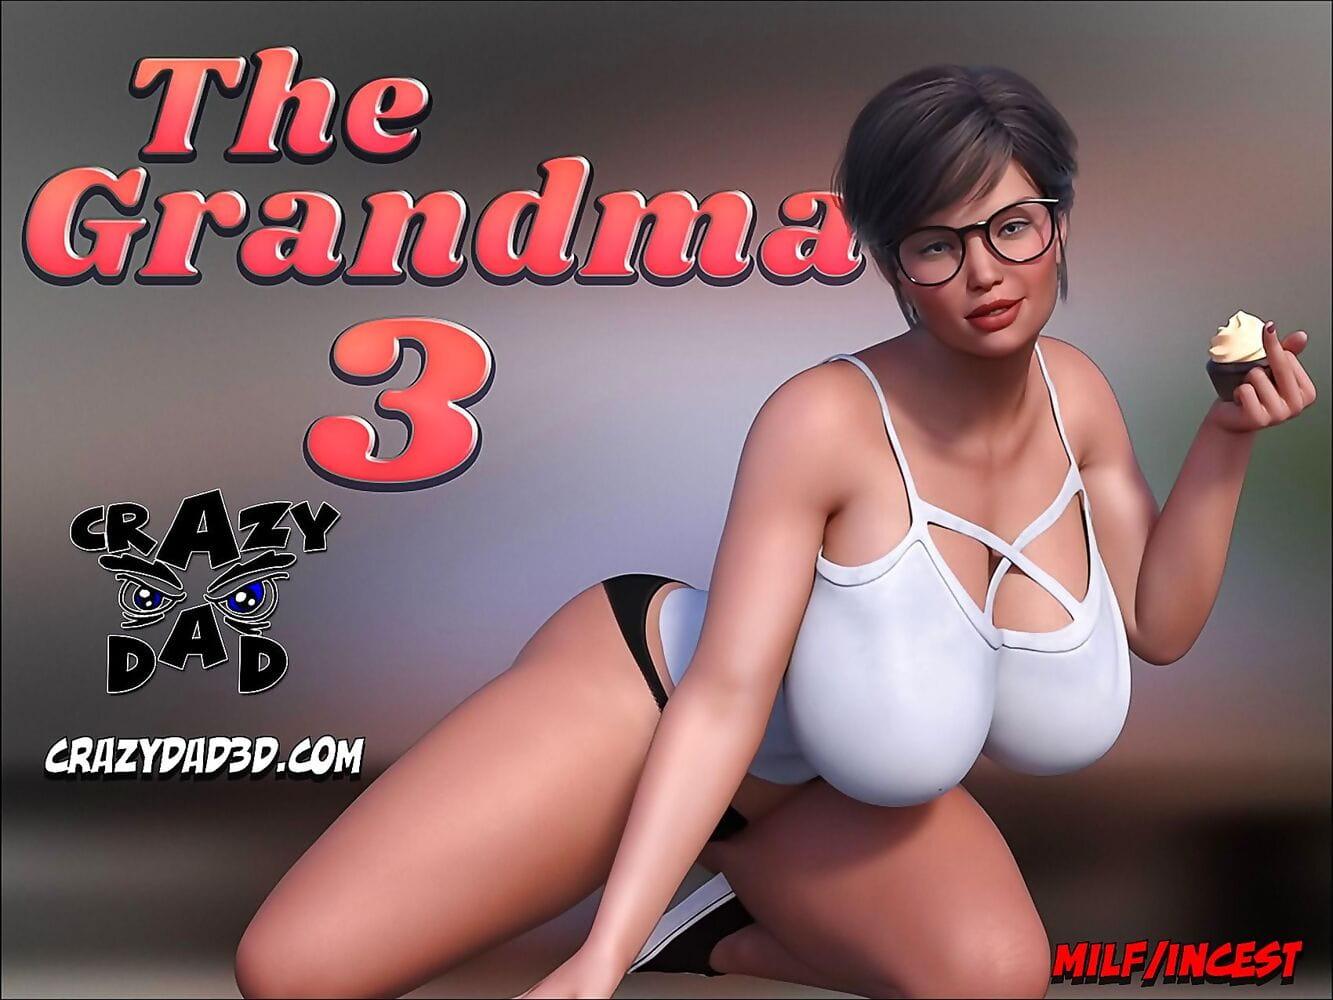 CrazyDad- The Grandma 3